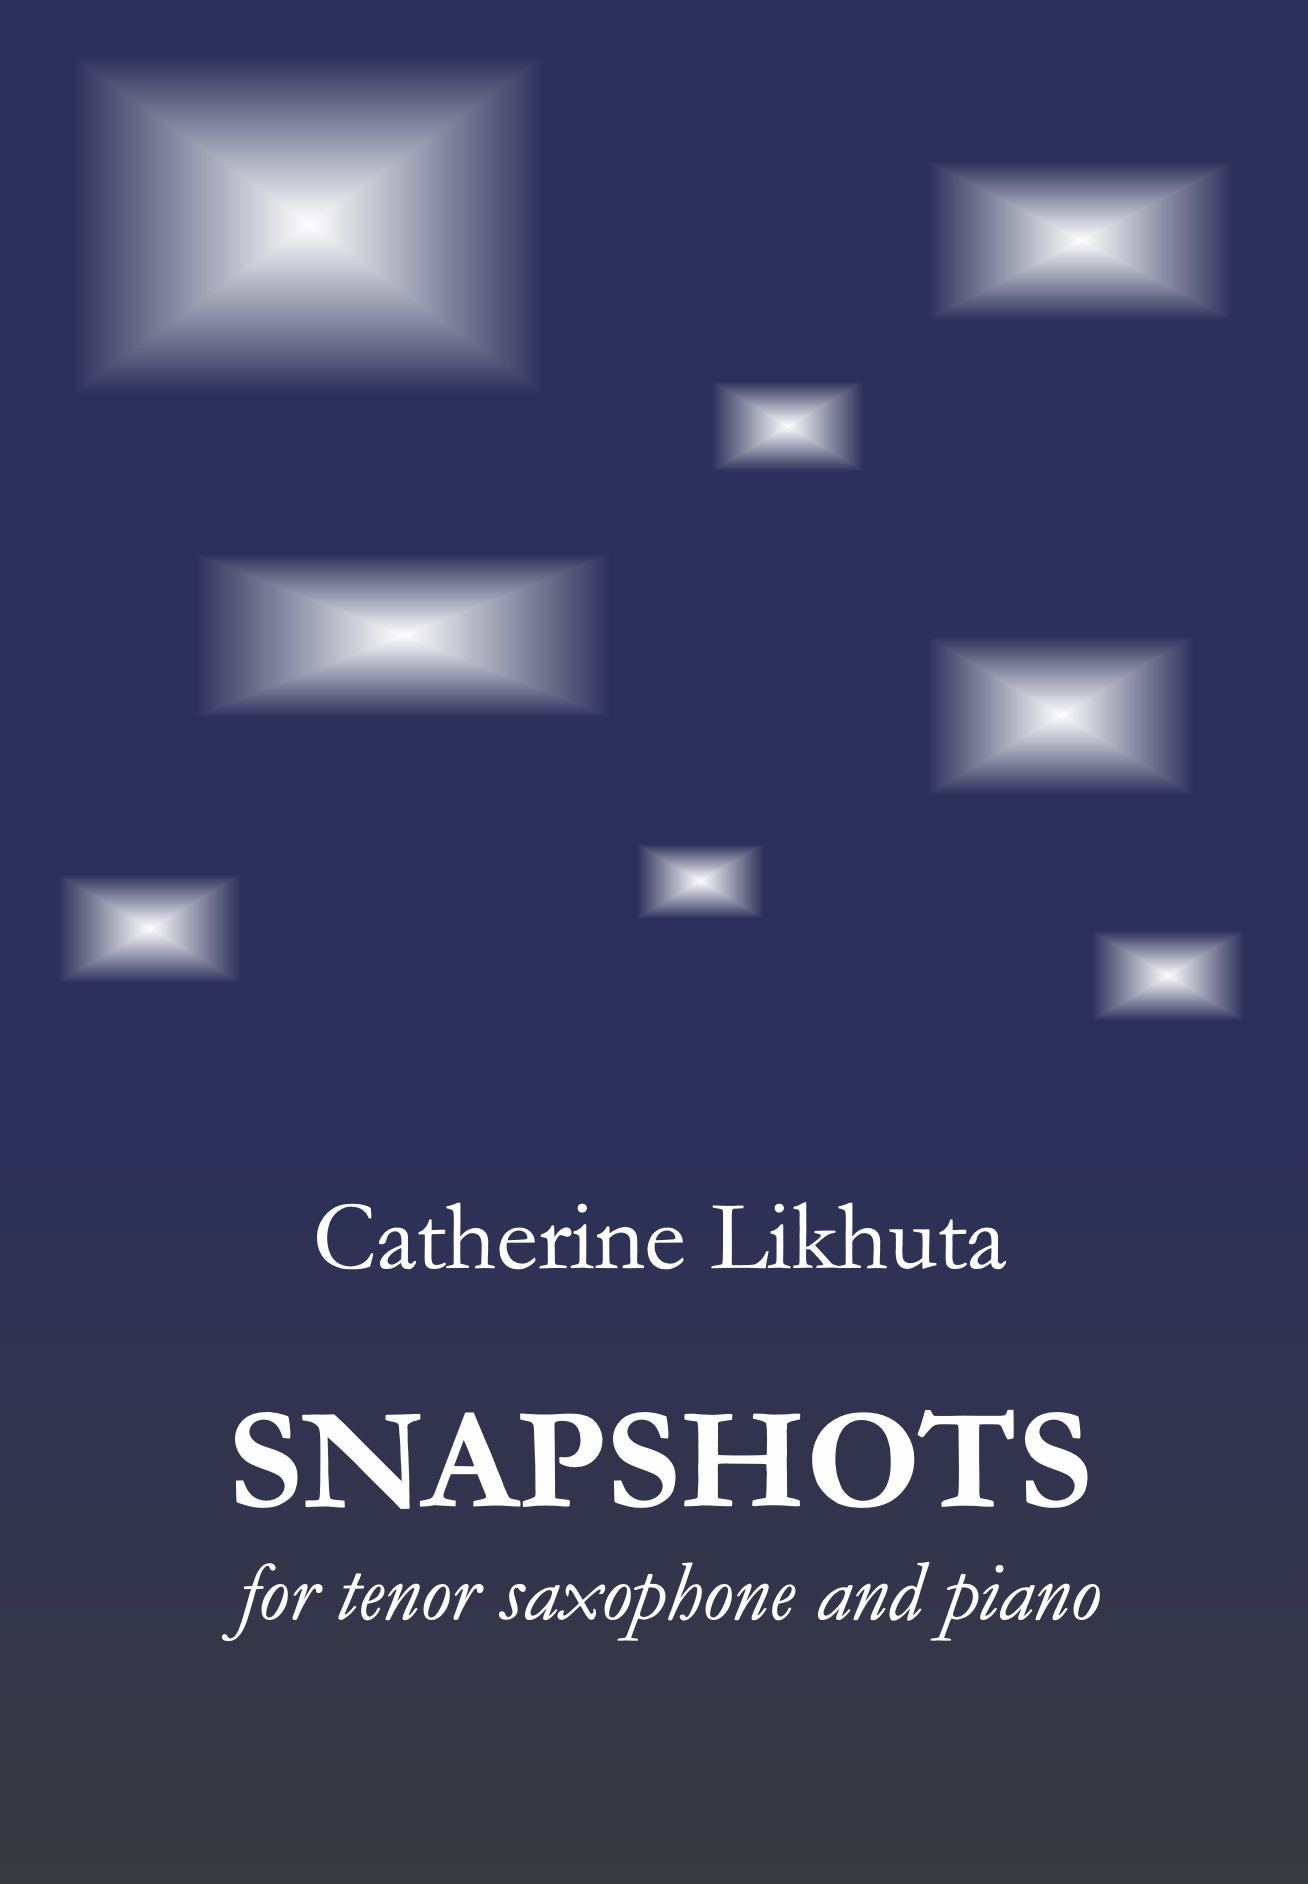 Snapshots (Likhuta) by Catherine Likhuta